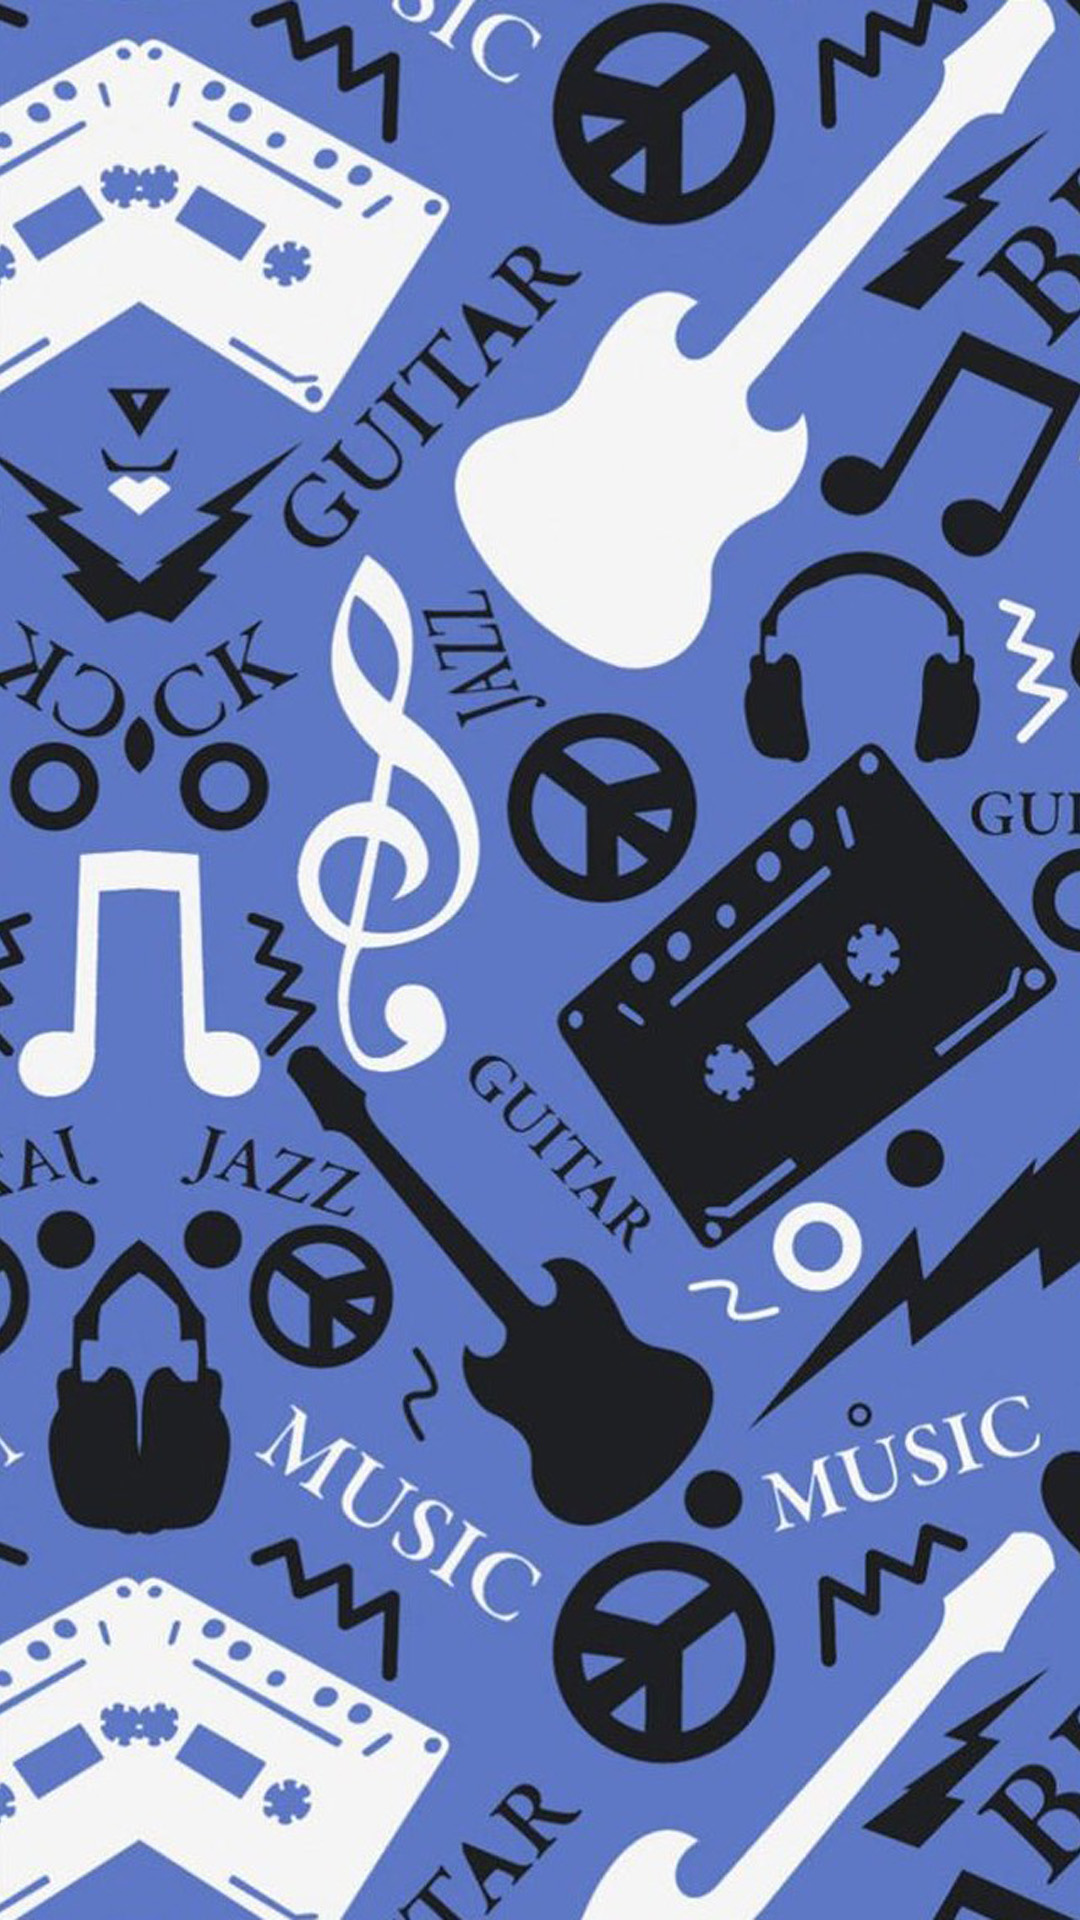 Download Wallpaper Music Pattern - Music-iPhone-6-Plus-Wallpaper-59  HD_335185.jpg